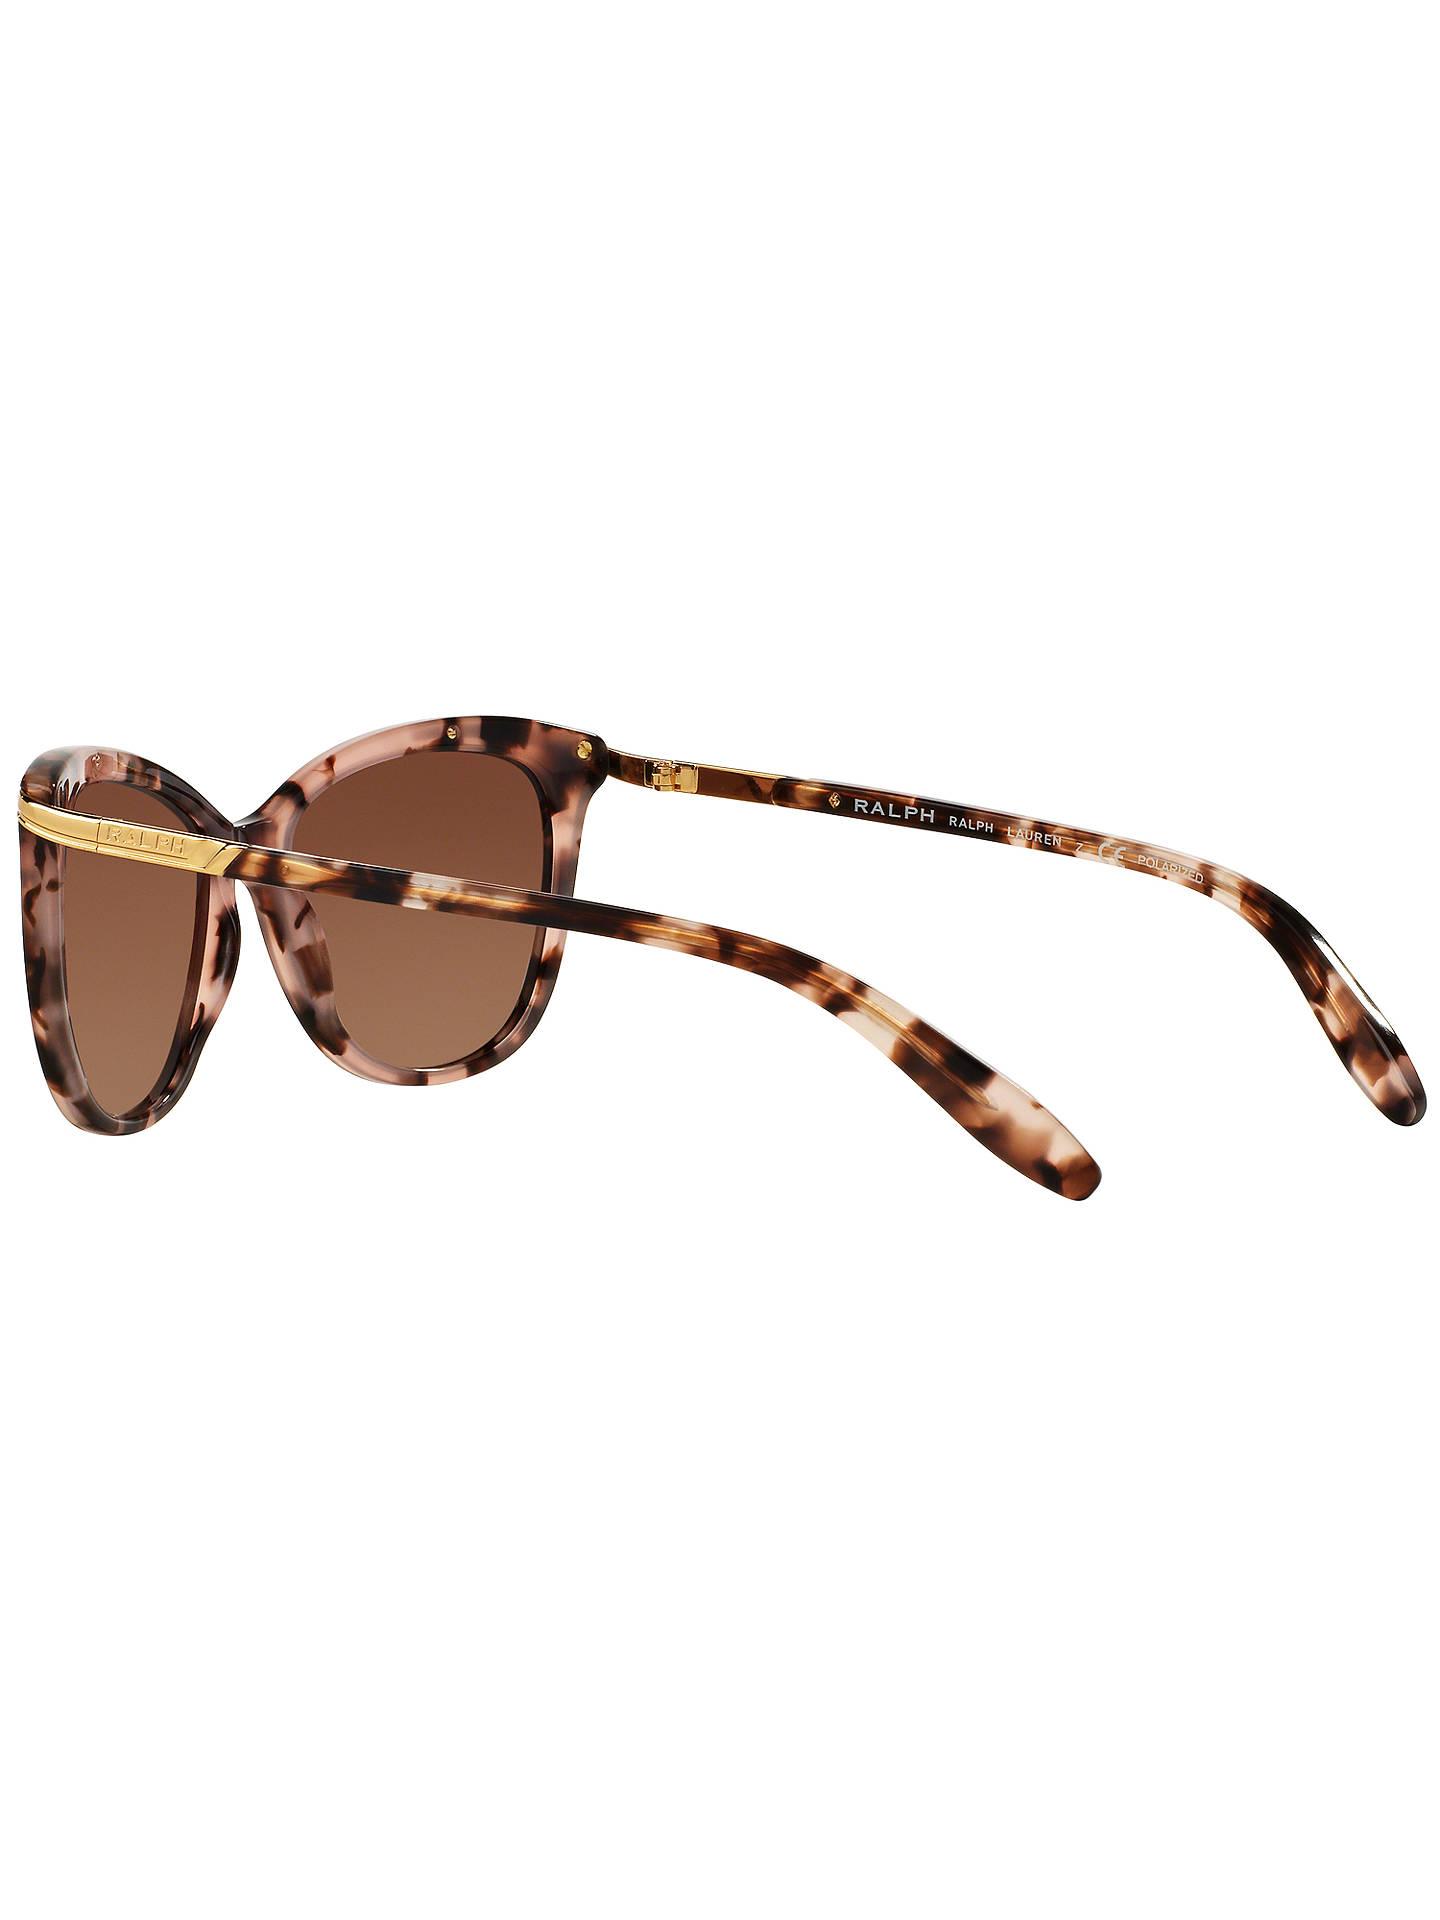 c10910686c7 ... BuyRalph RA5203 Polarised Cat s Eye Sunglasses